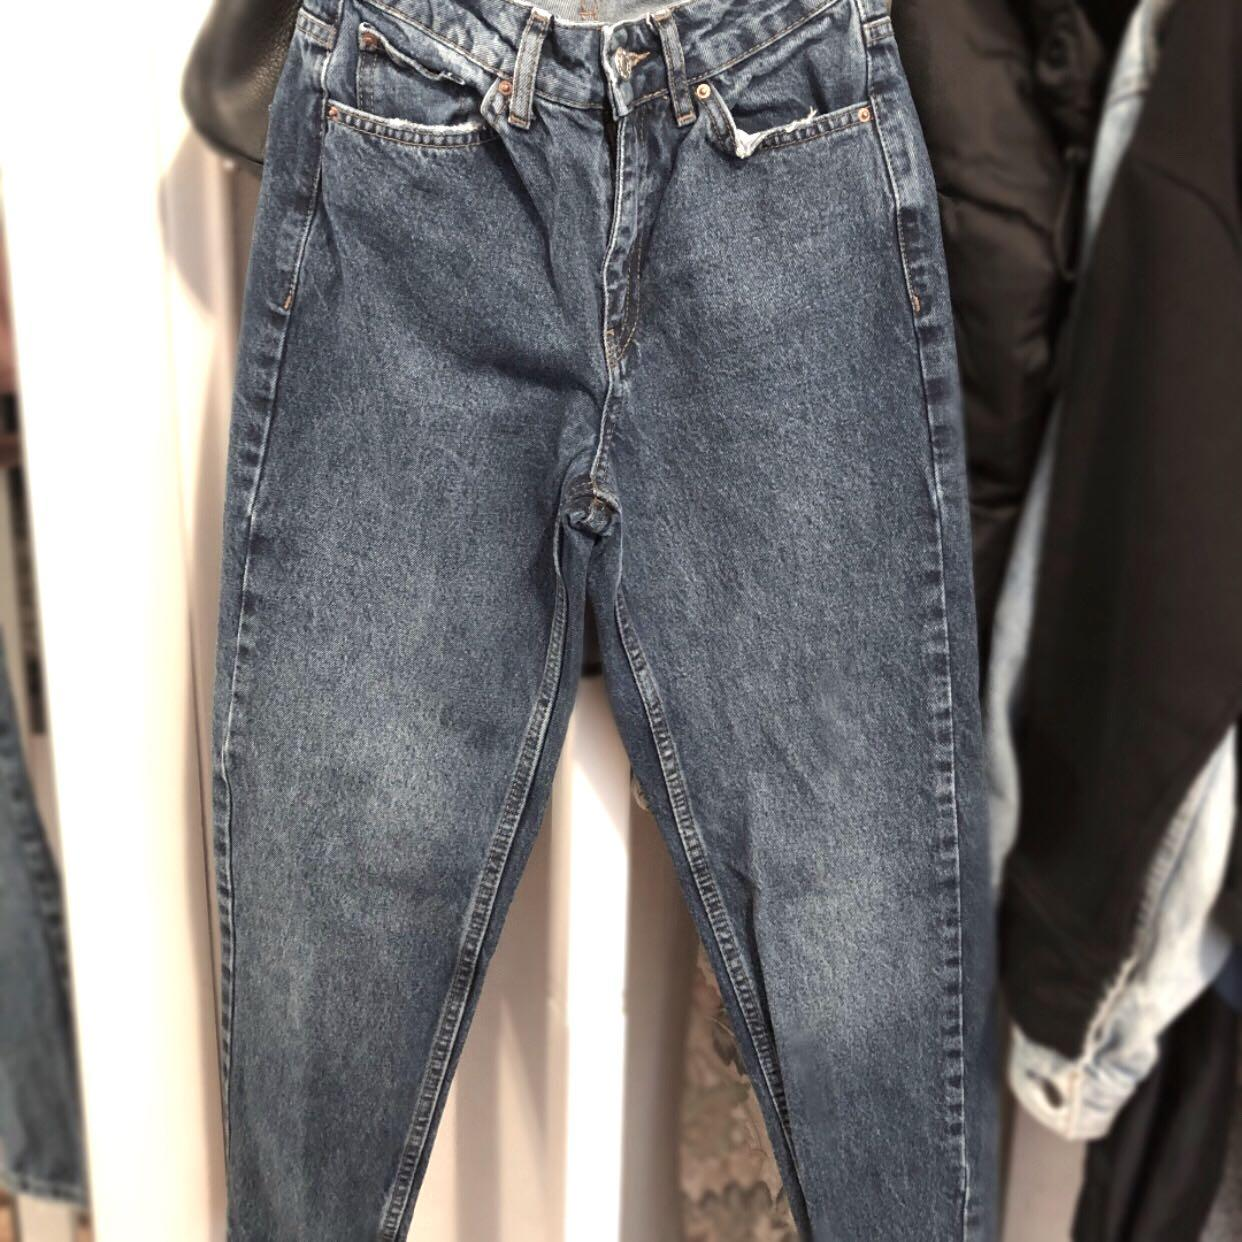 Top Shop Petite Mom Jeans